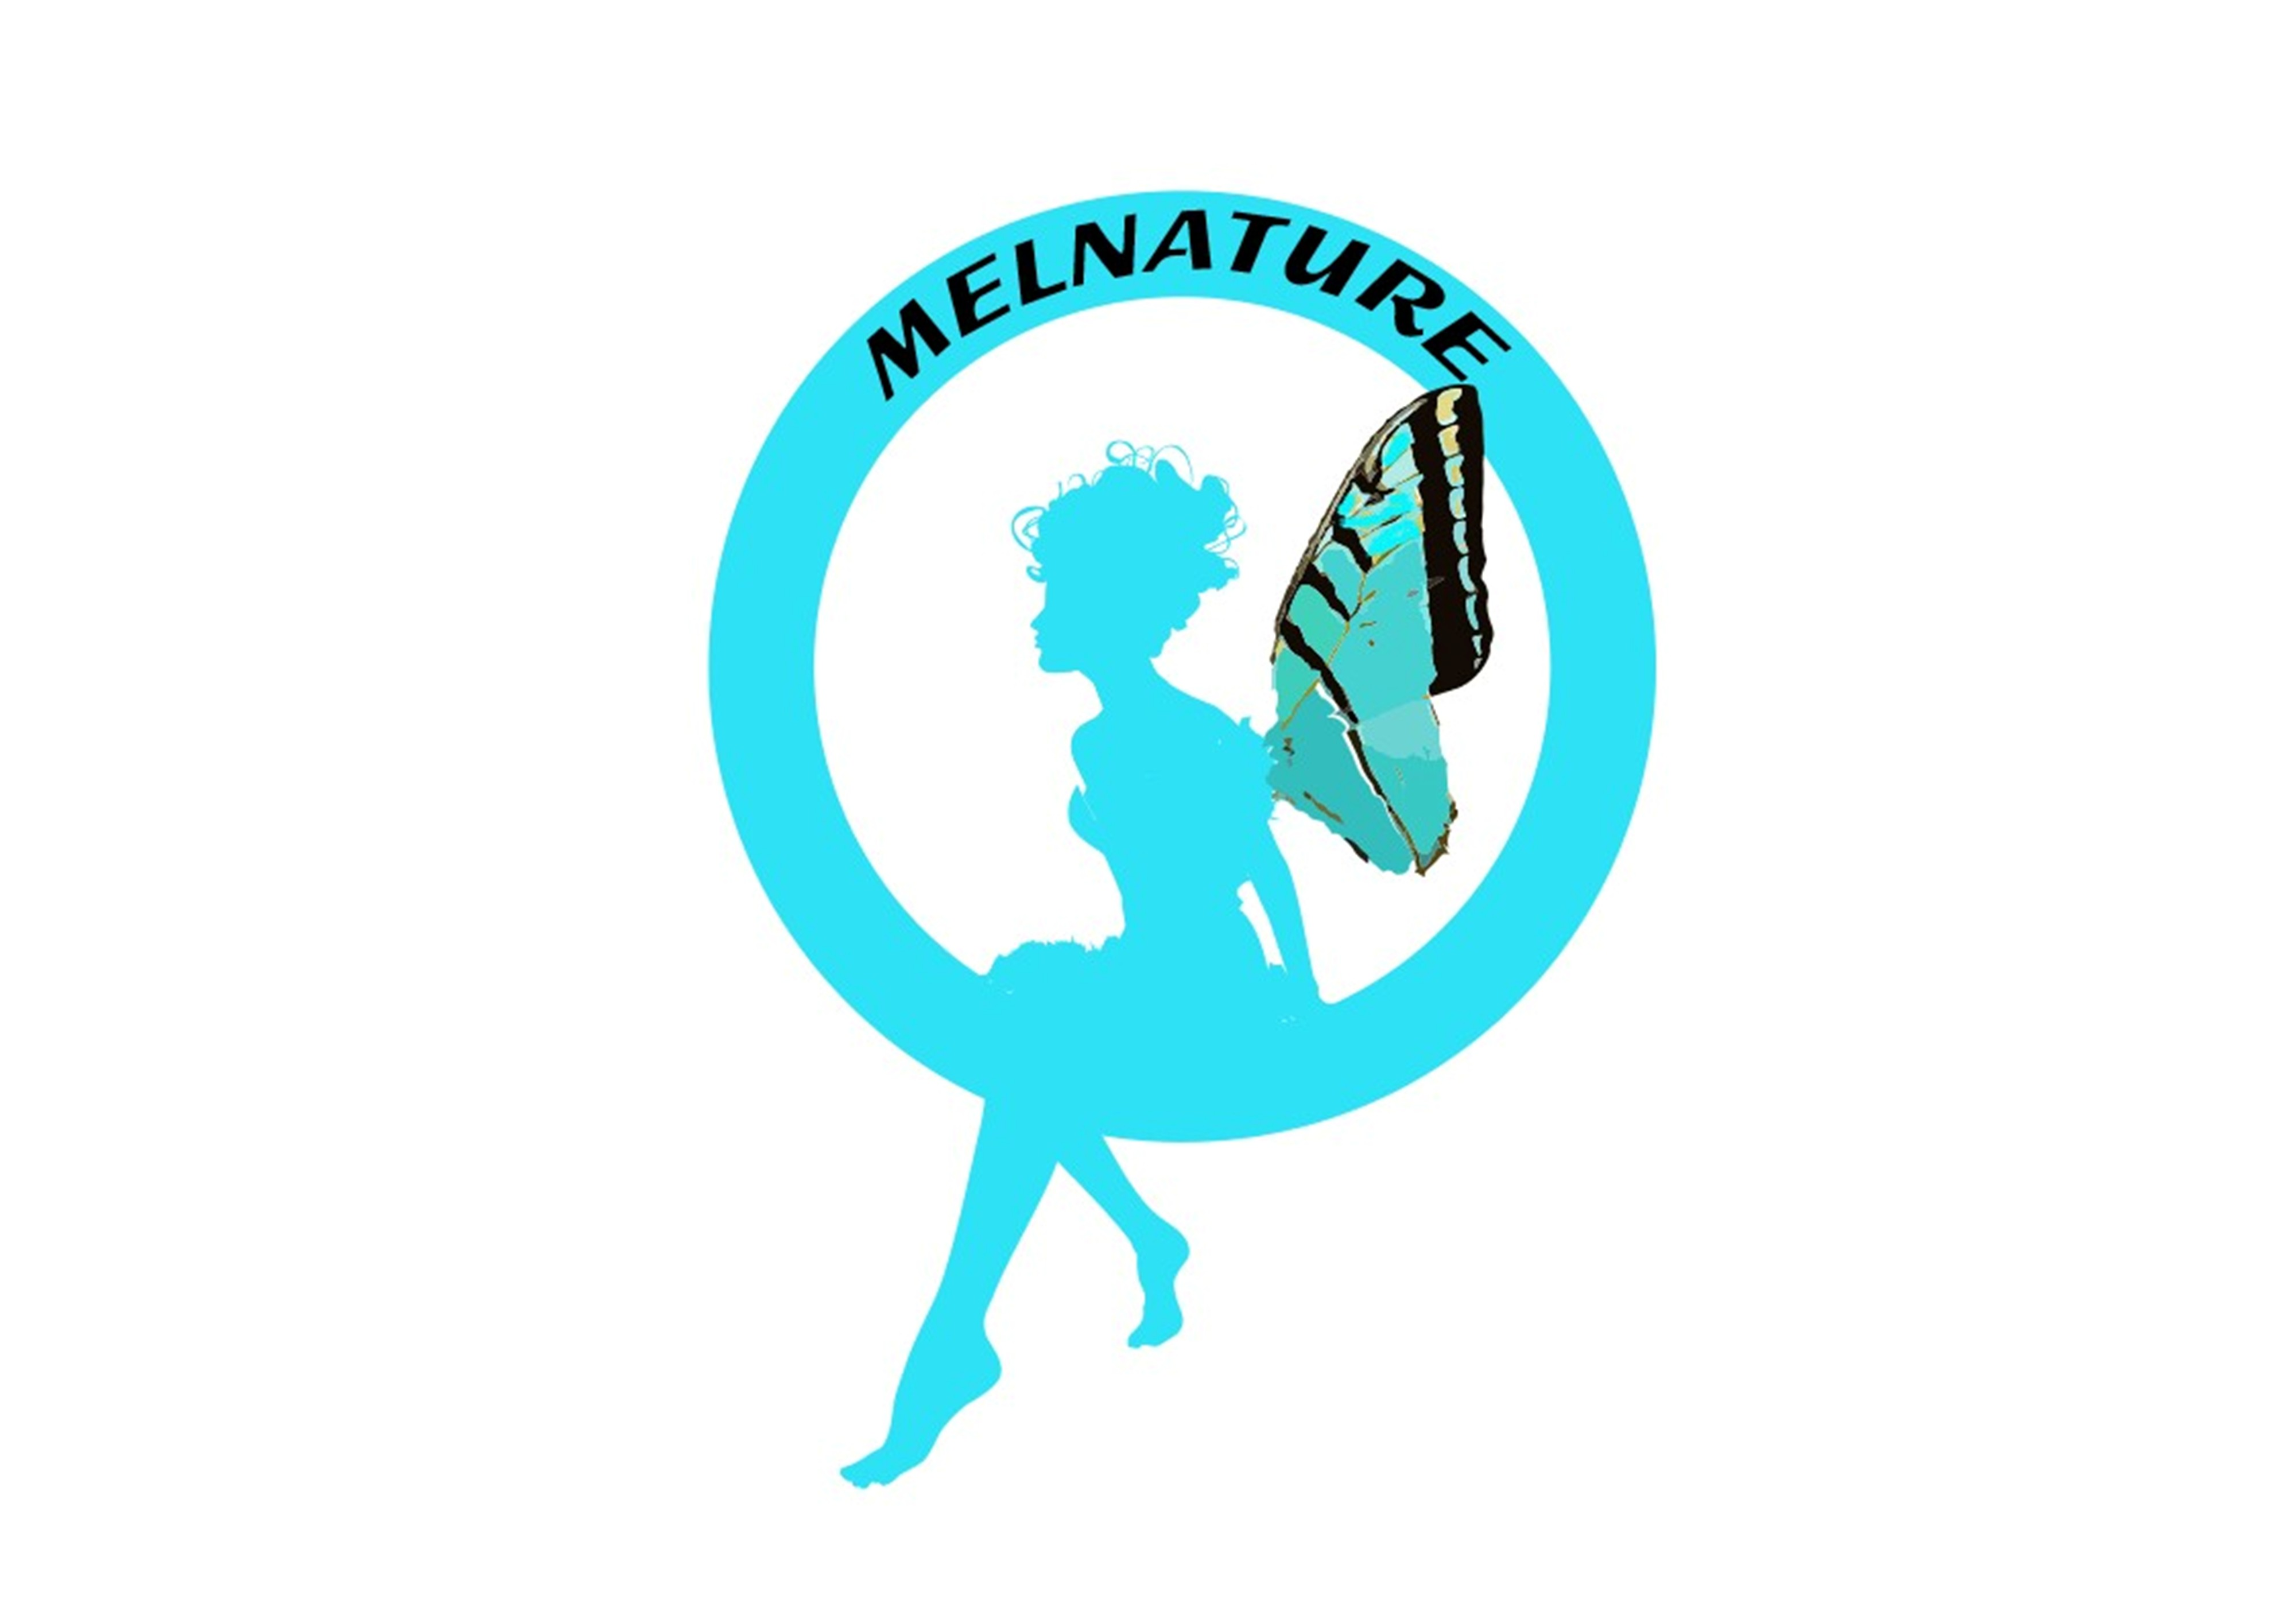 Melnature